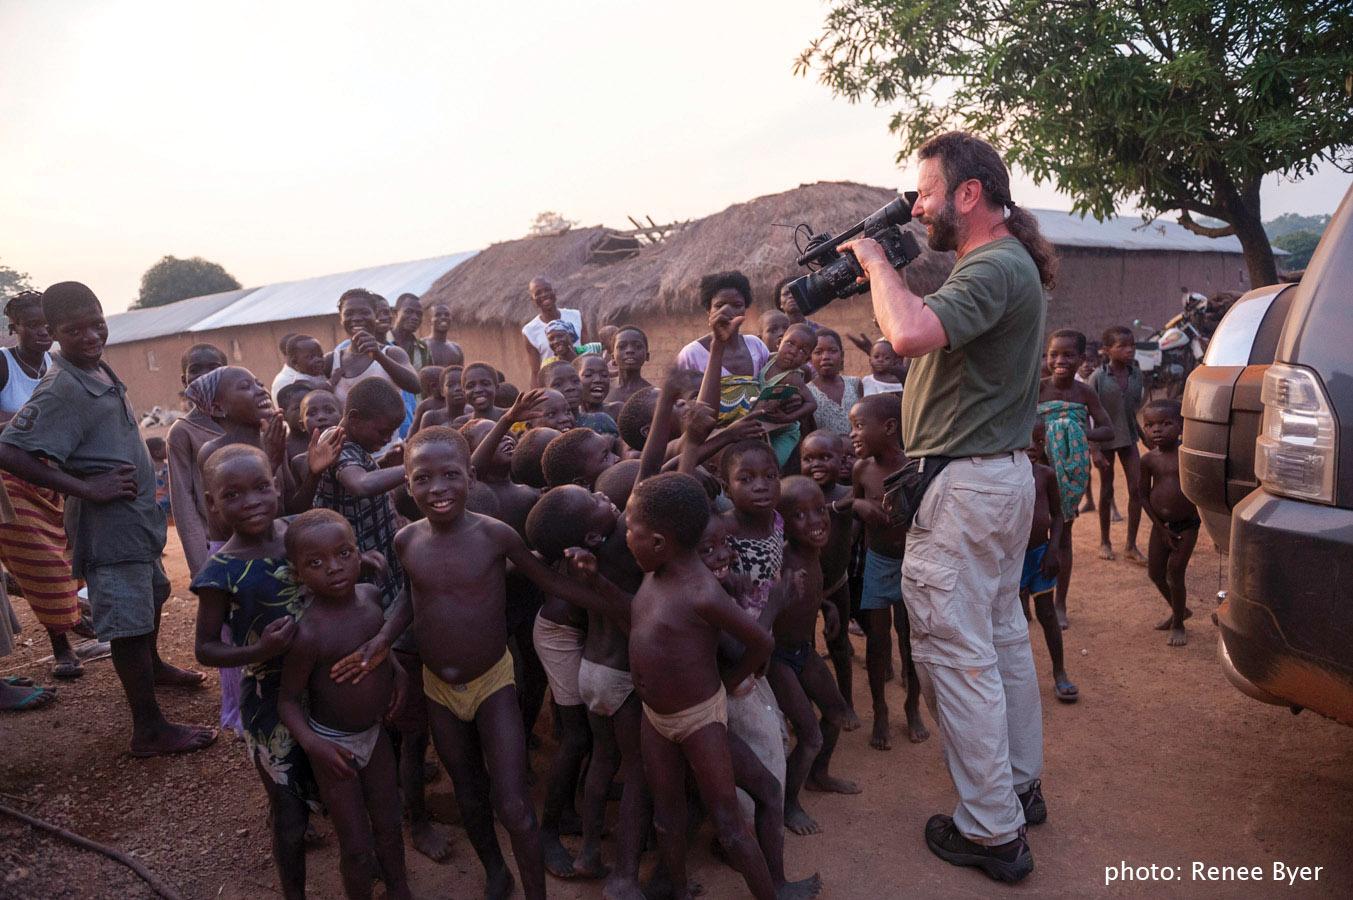 George Rosenfeld Upper Volta, Ghana 2010 Renée Byer